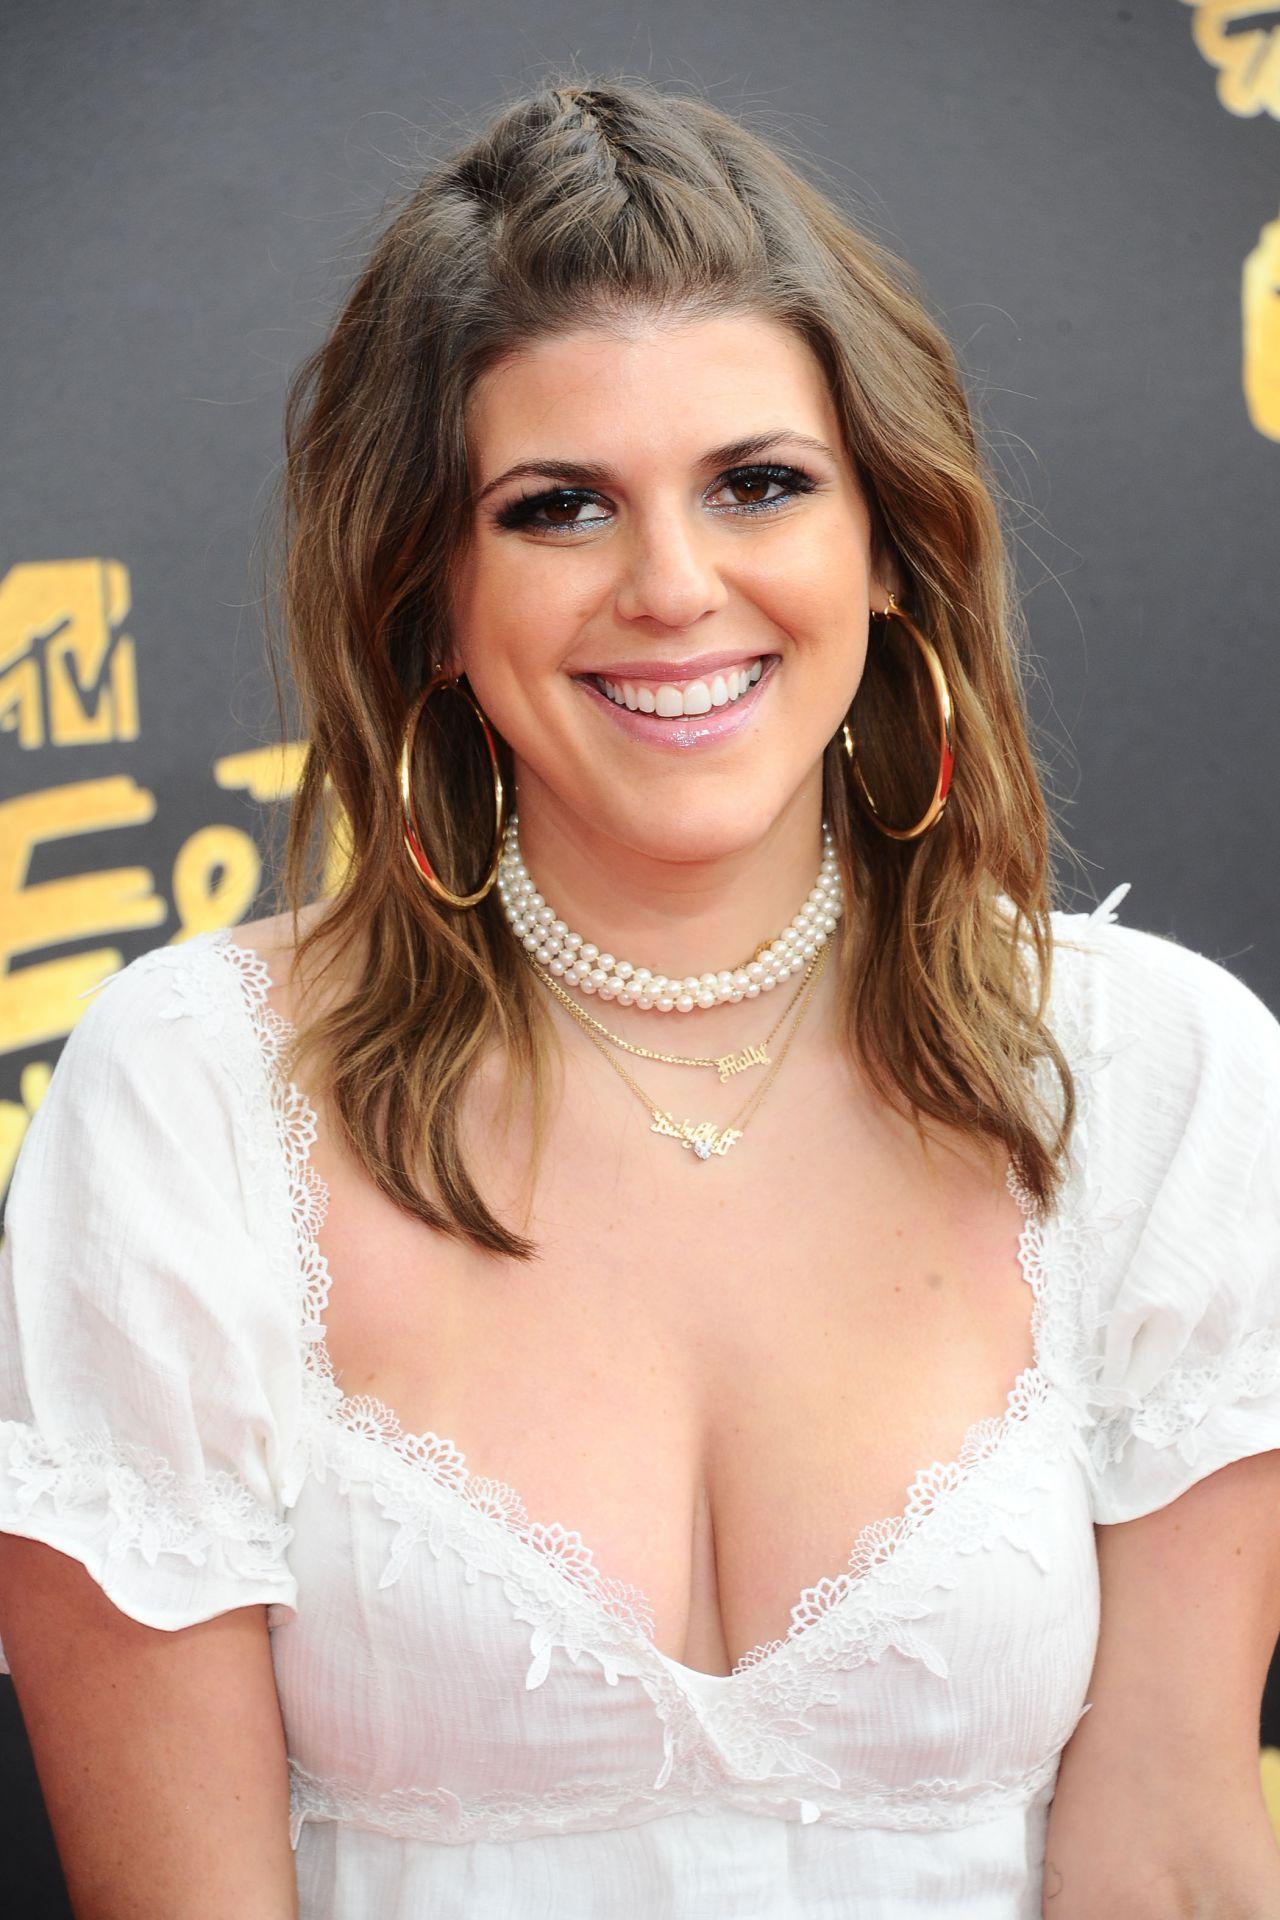 Jessica's sister, Molly Tarlov